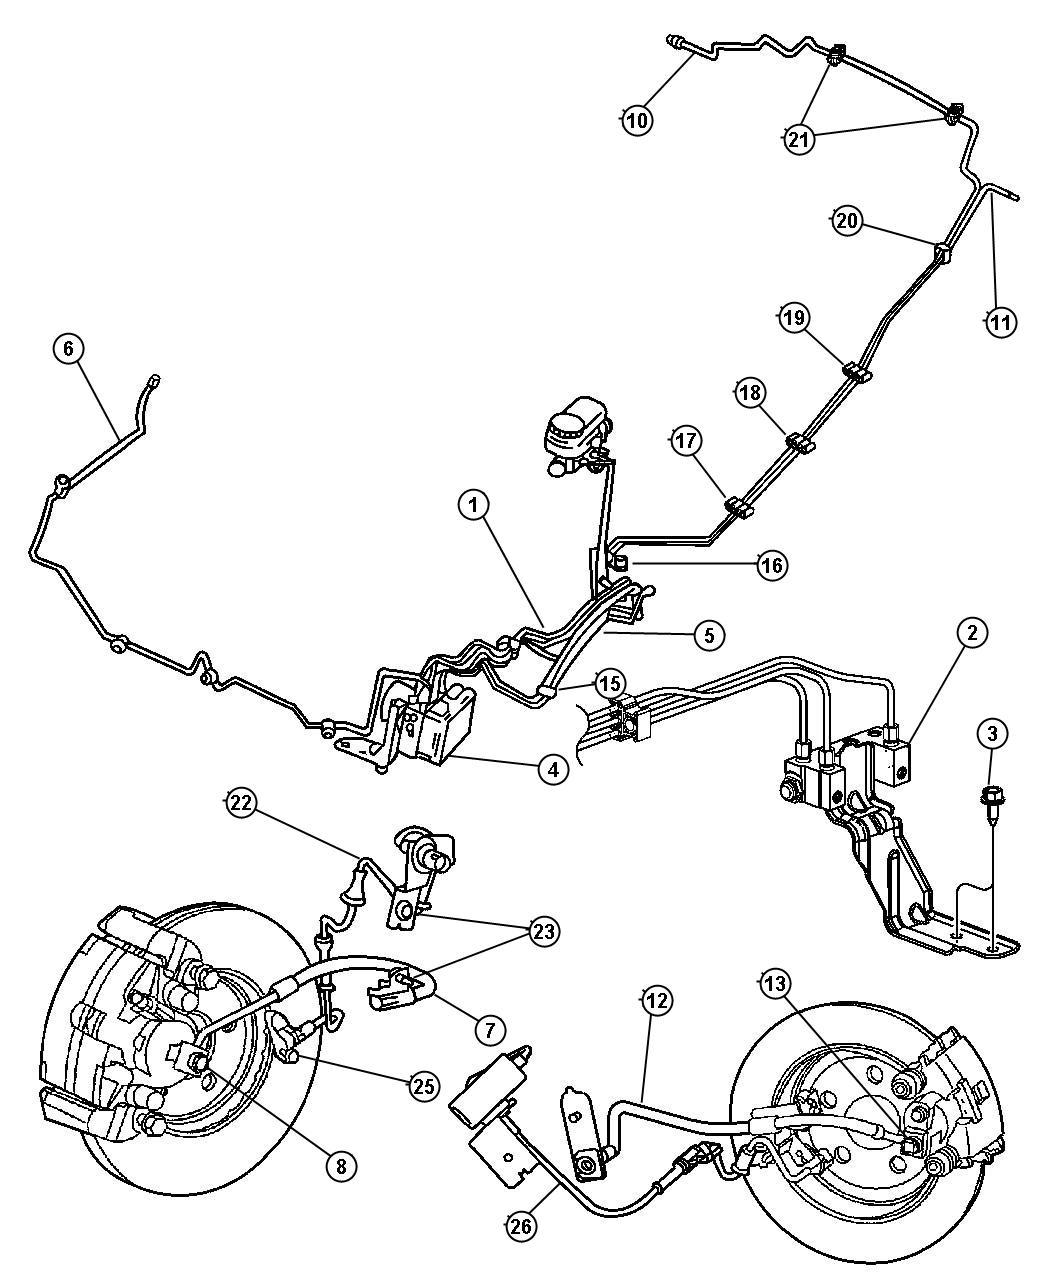 Chrysler Sebring Prop Valve Brake Brb Brakes